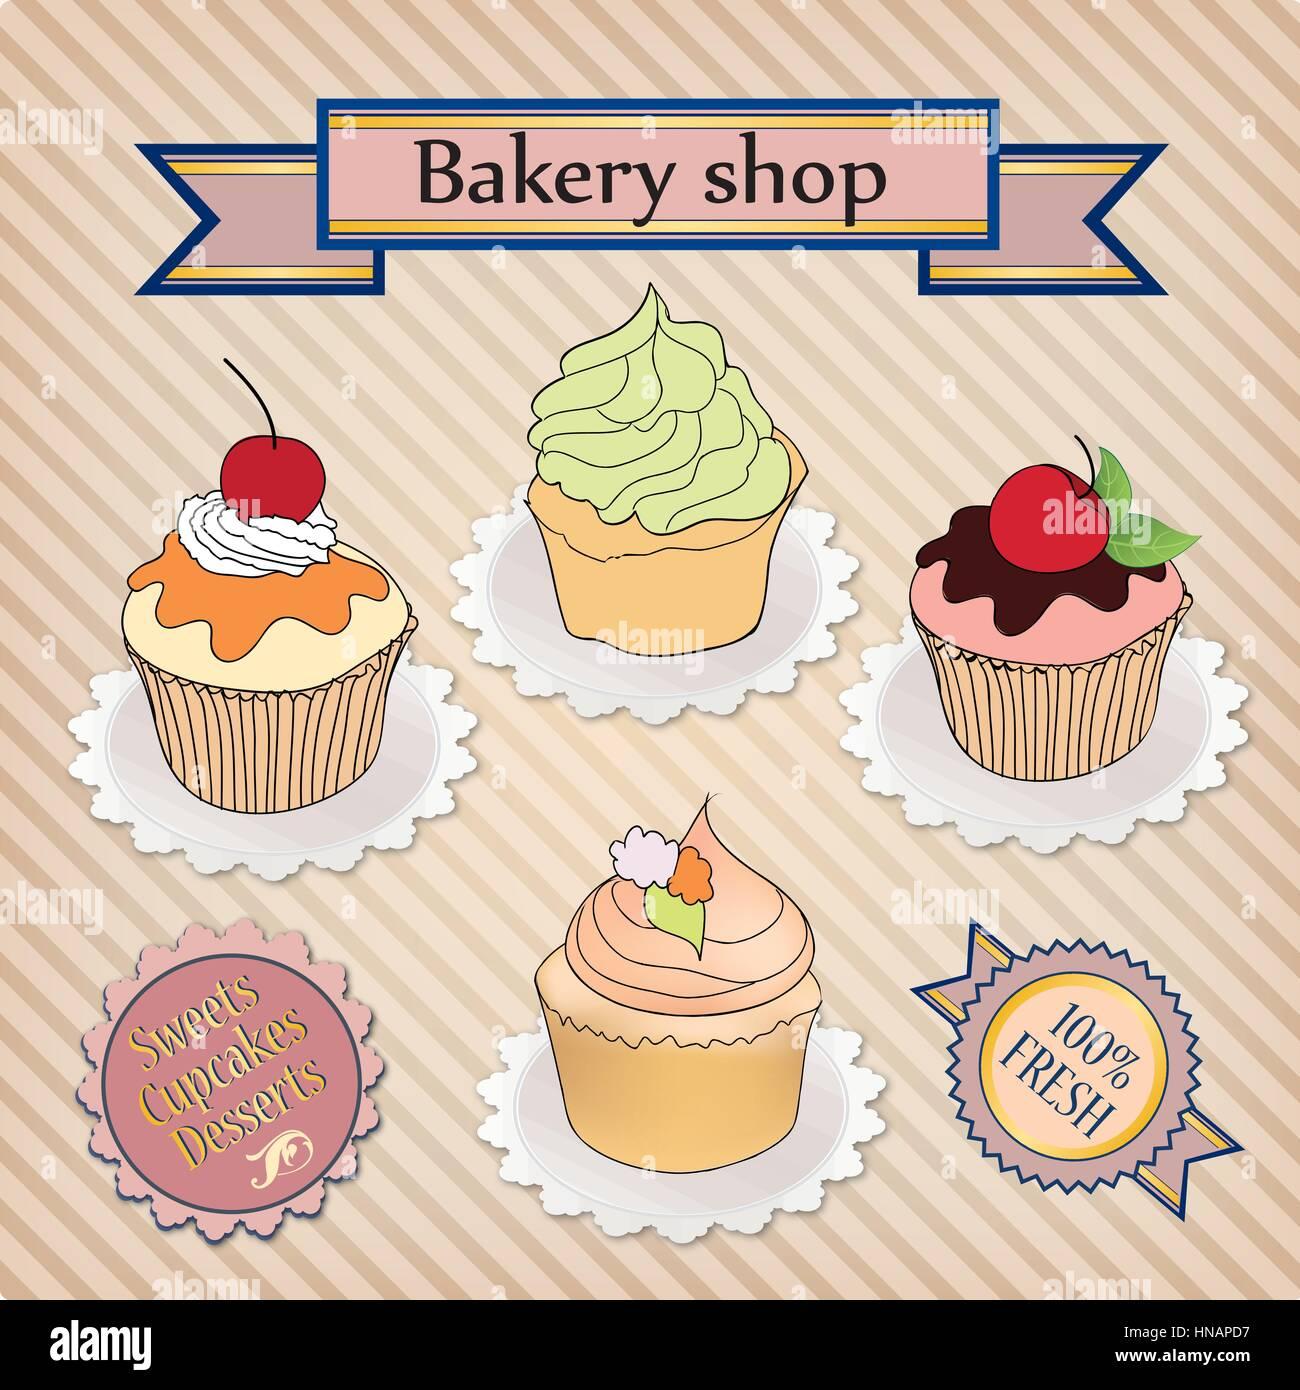 Bakery Shop Label Vintage Cupcake Poster Design Sweets In